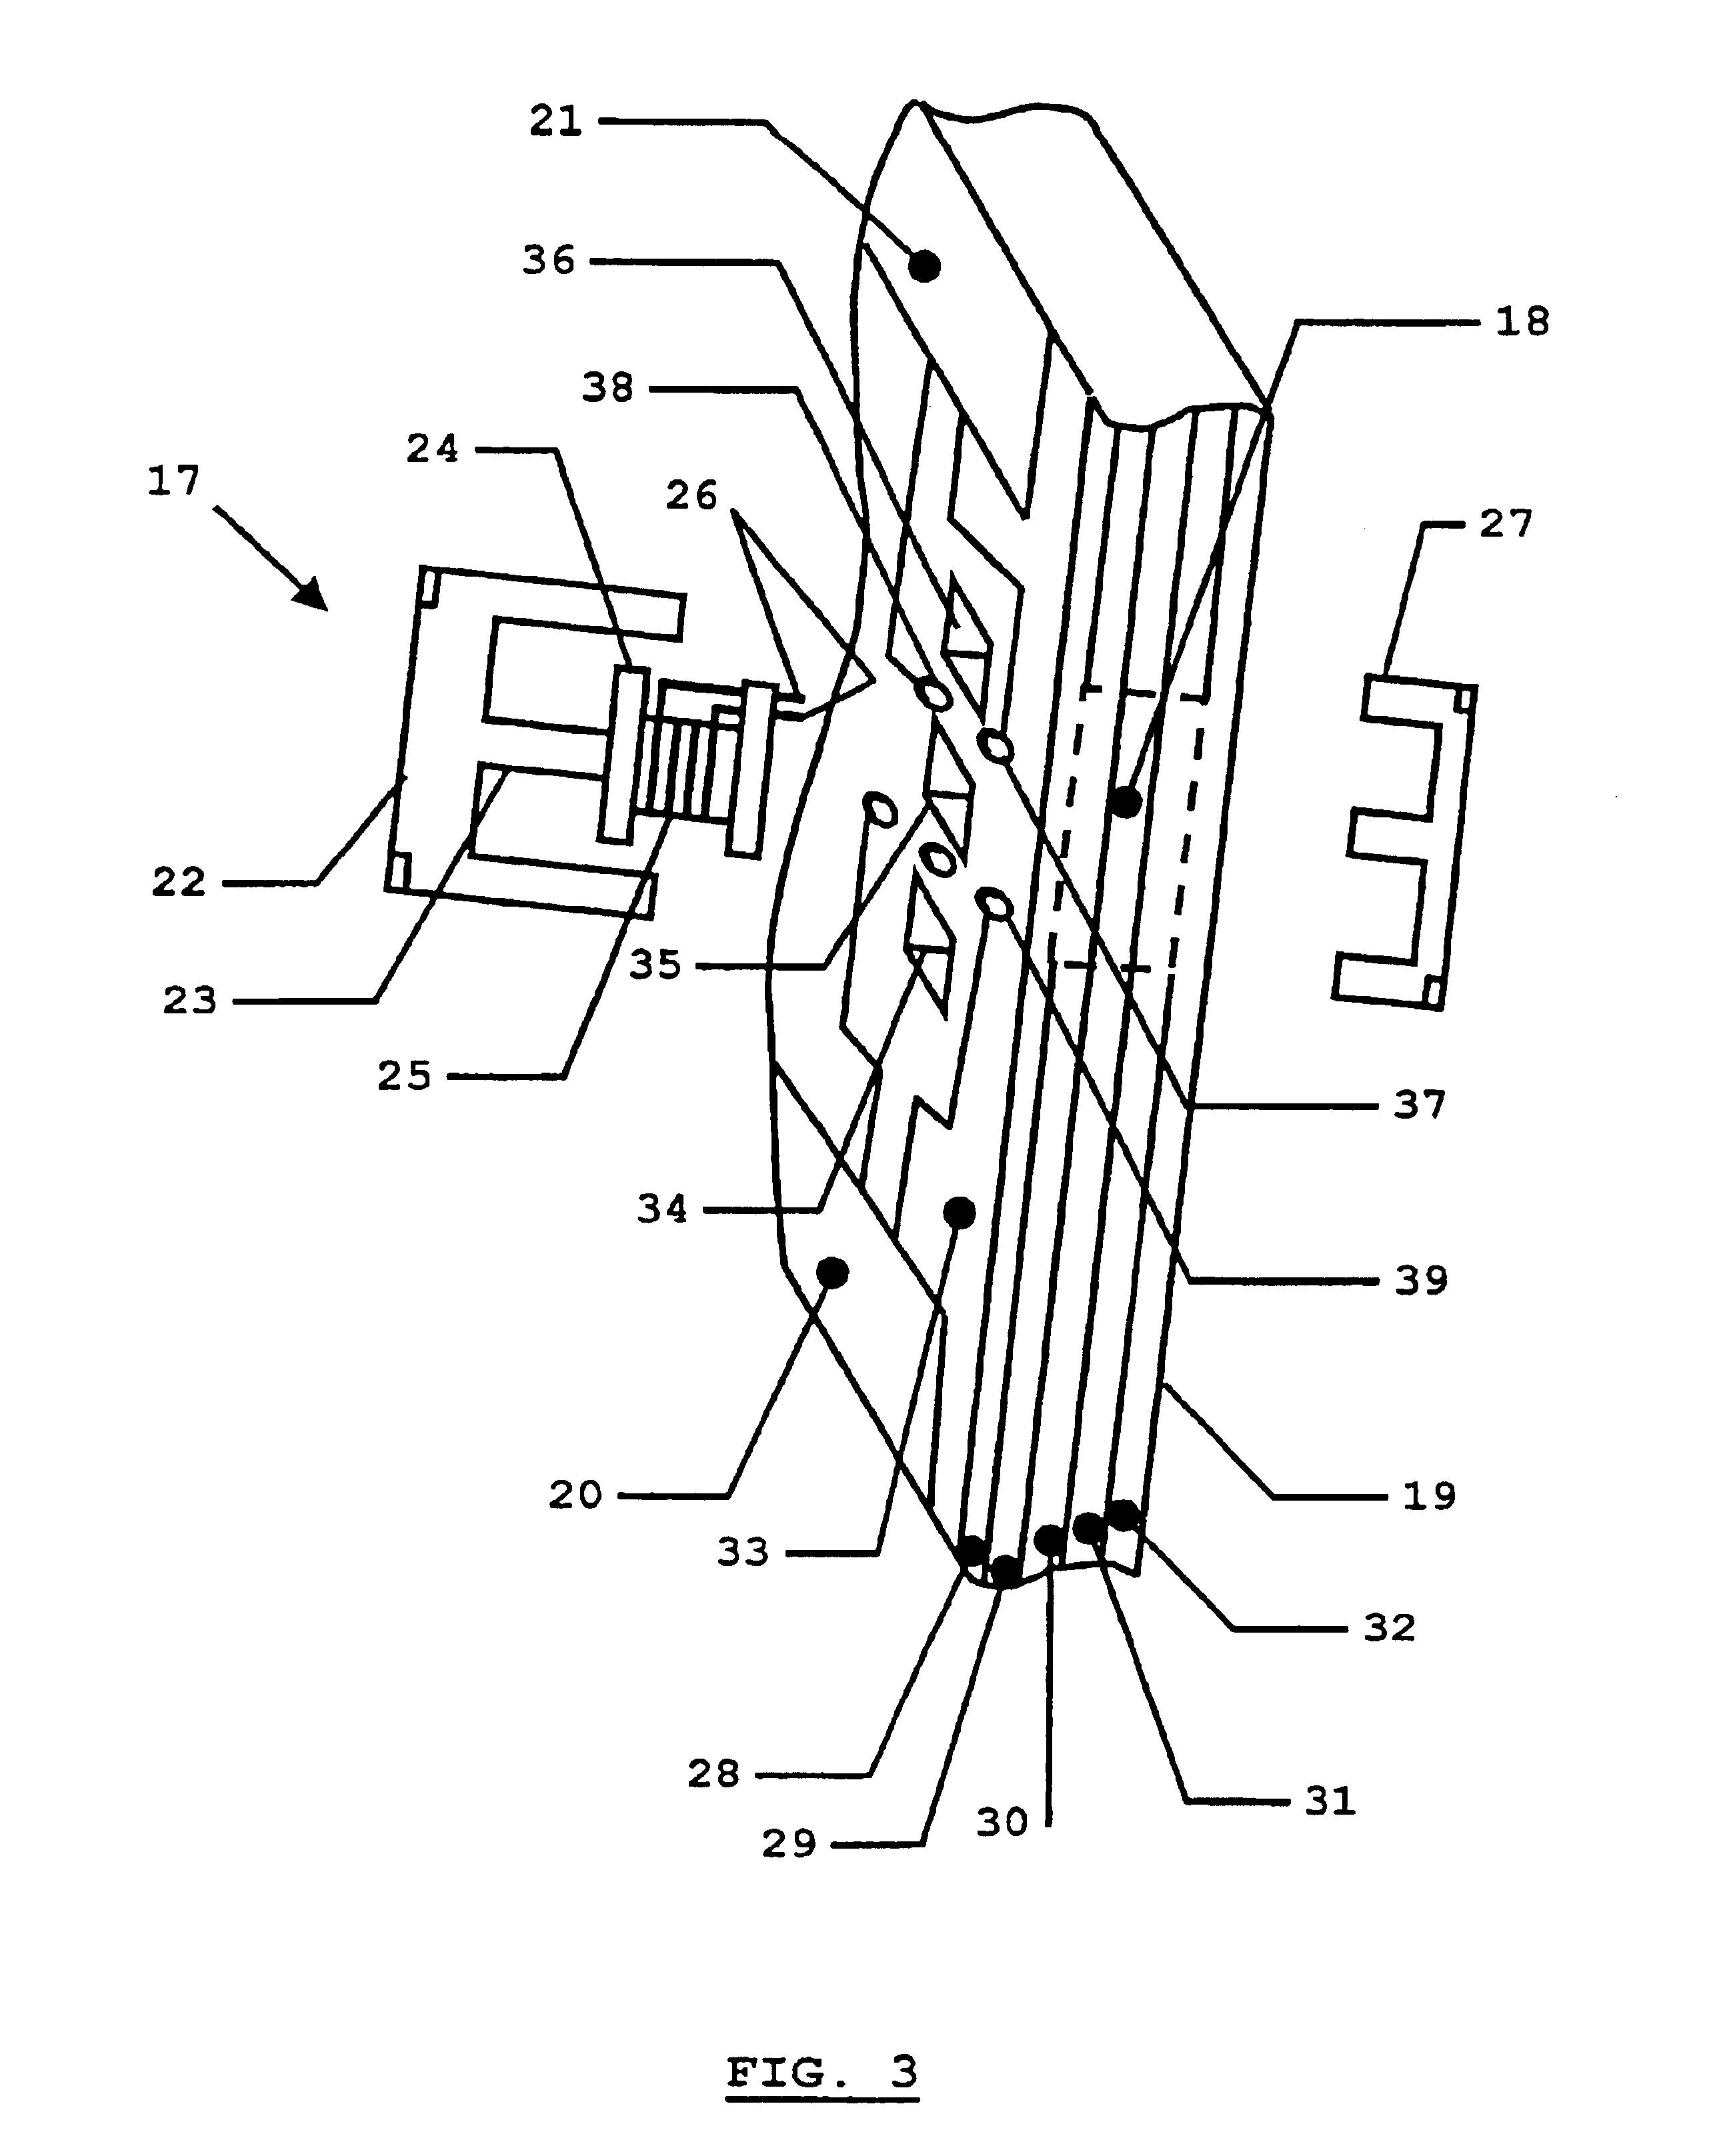 Hammond Delta Wye Transformer Wiring Diagrams on